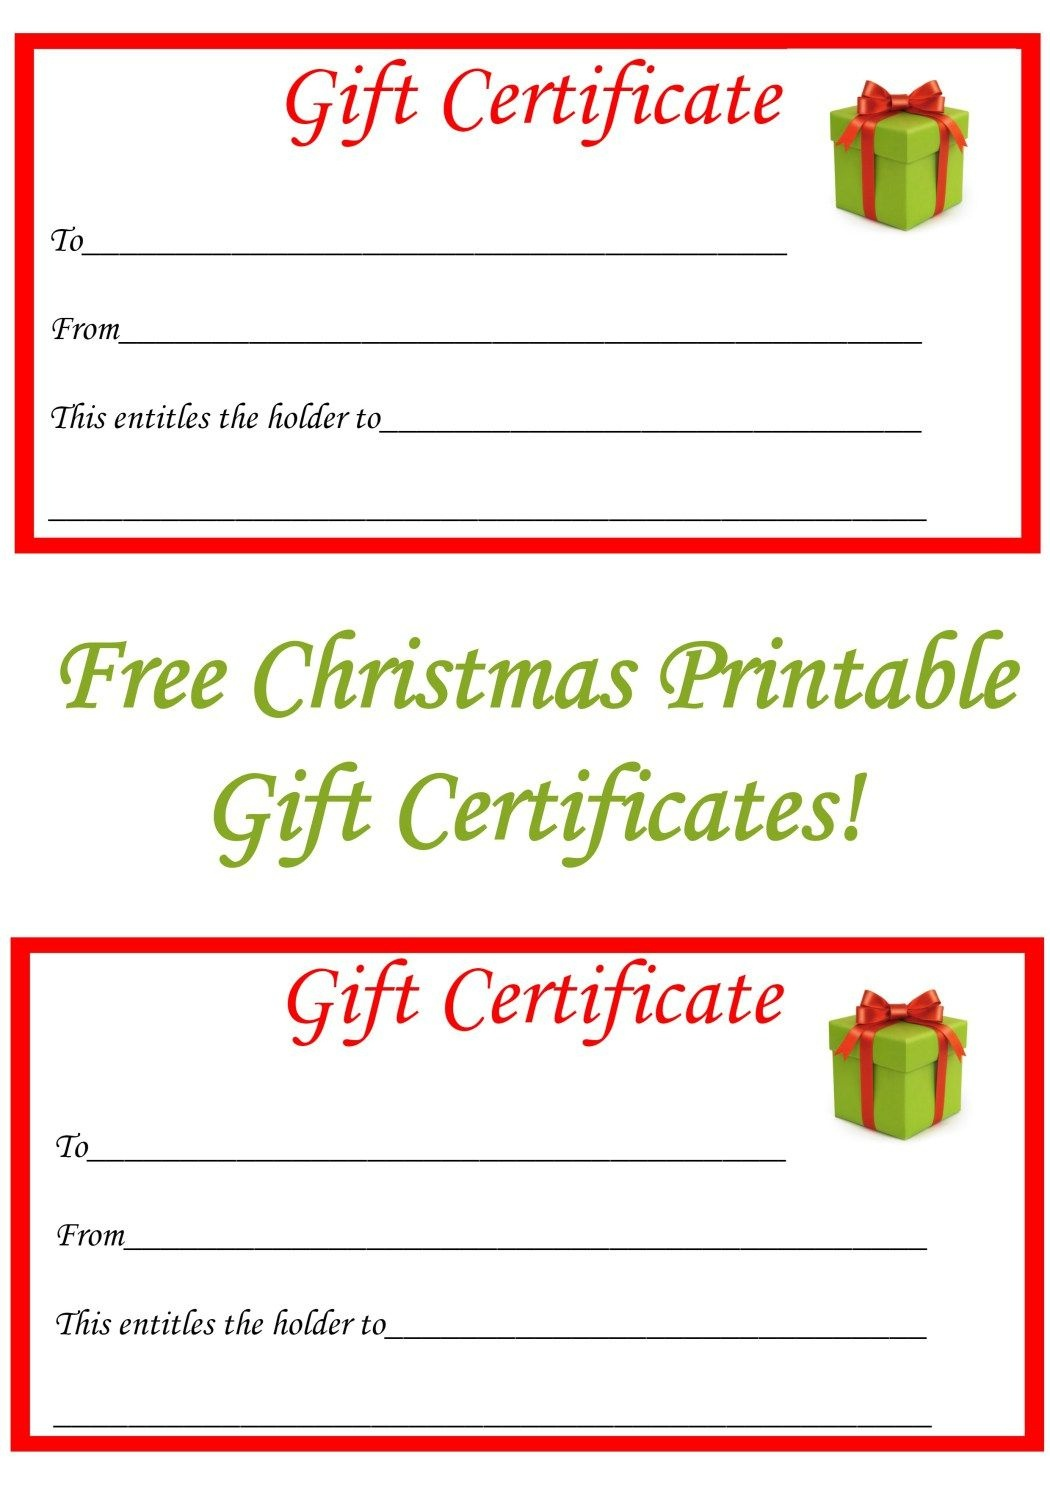 Free Christmas Printable Gift Certificates | Gift Ideas | Christmas - Free Printable Pedicure Gift Certificate